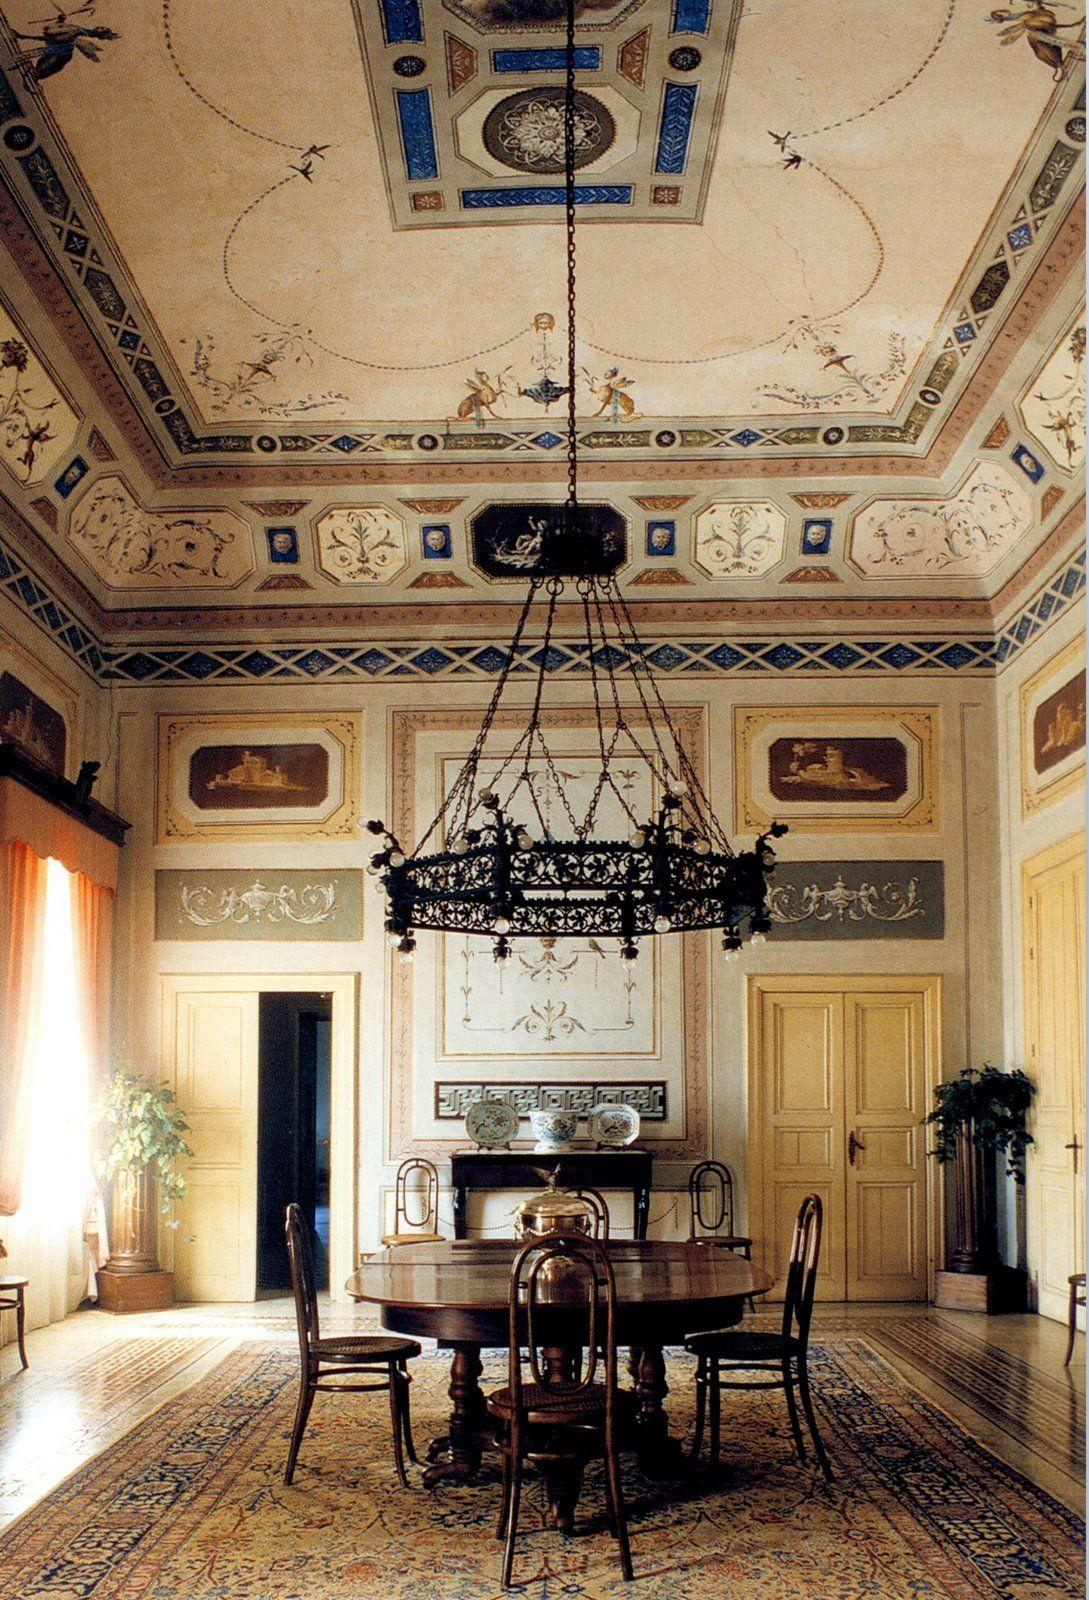 villa spedalotta in sicily. dining perfection under that exquisite